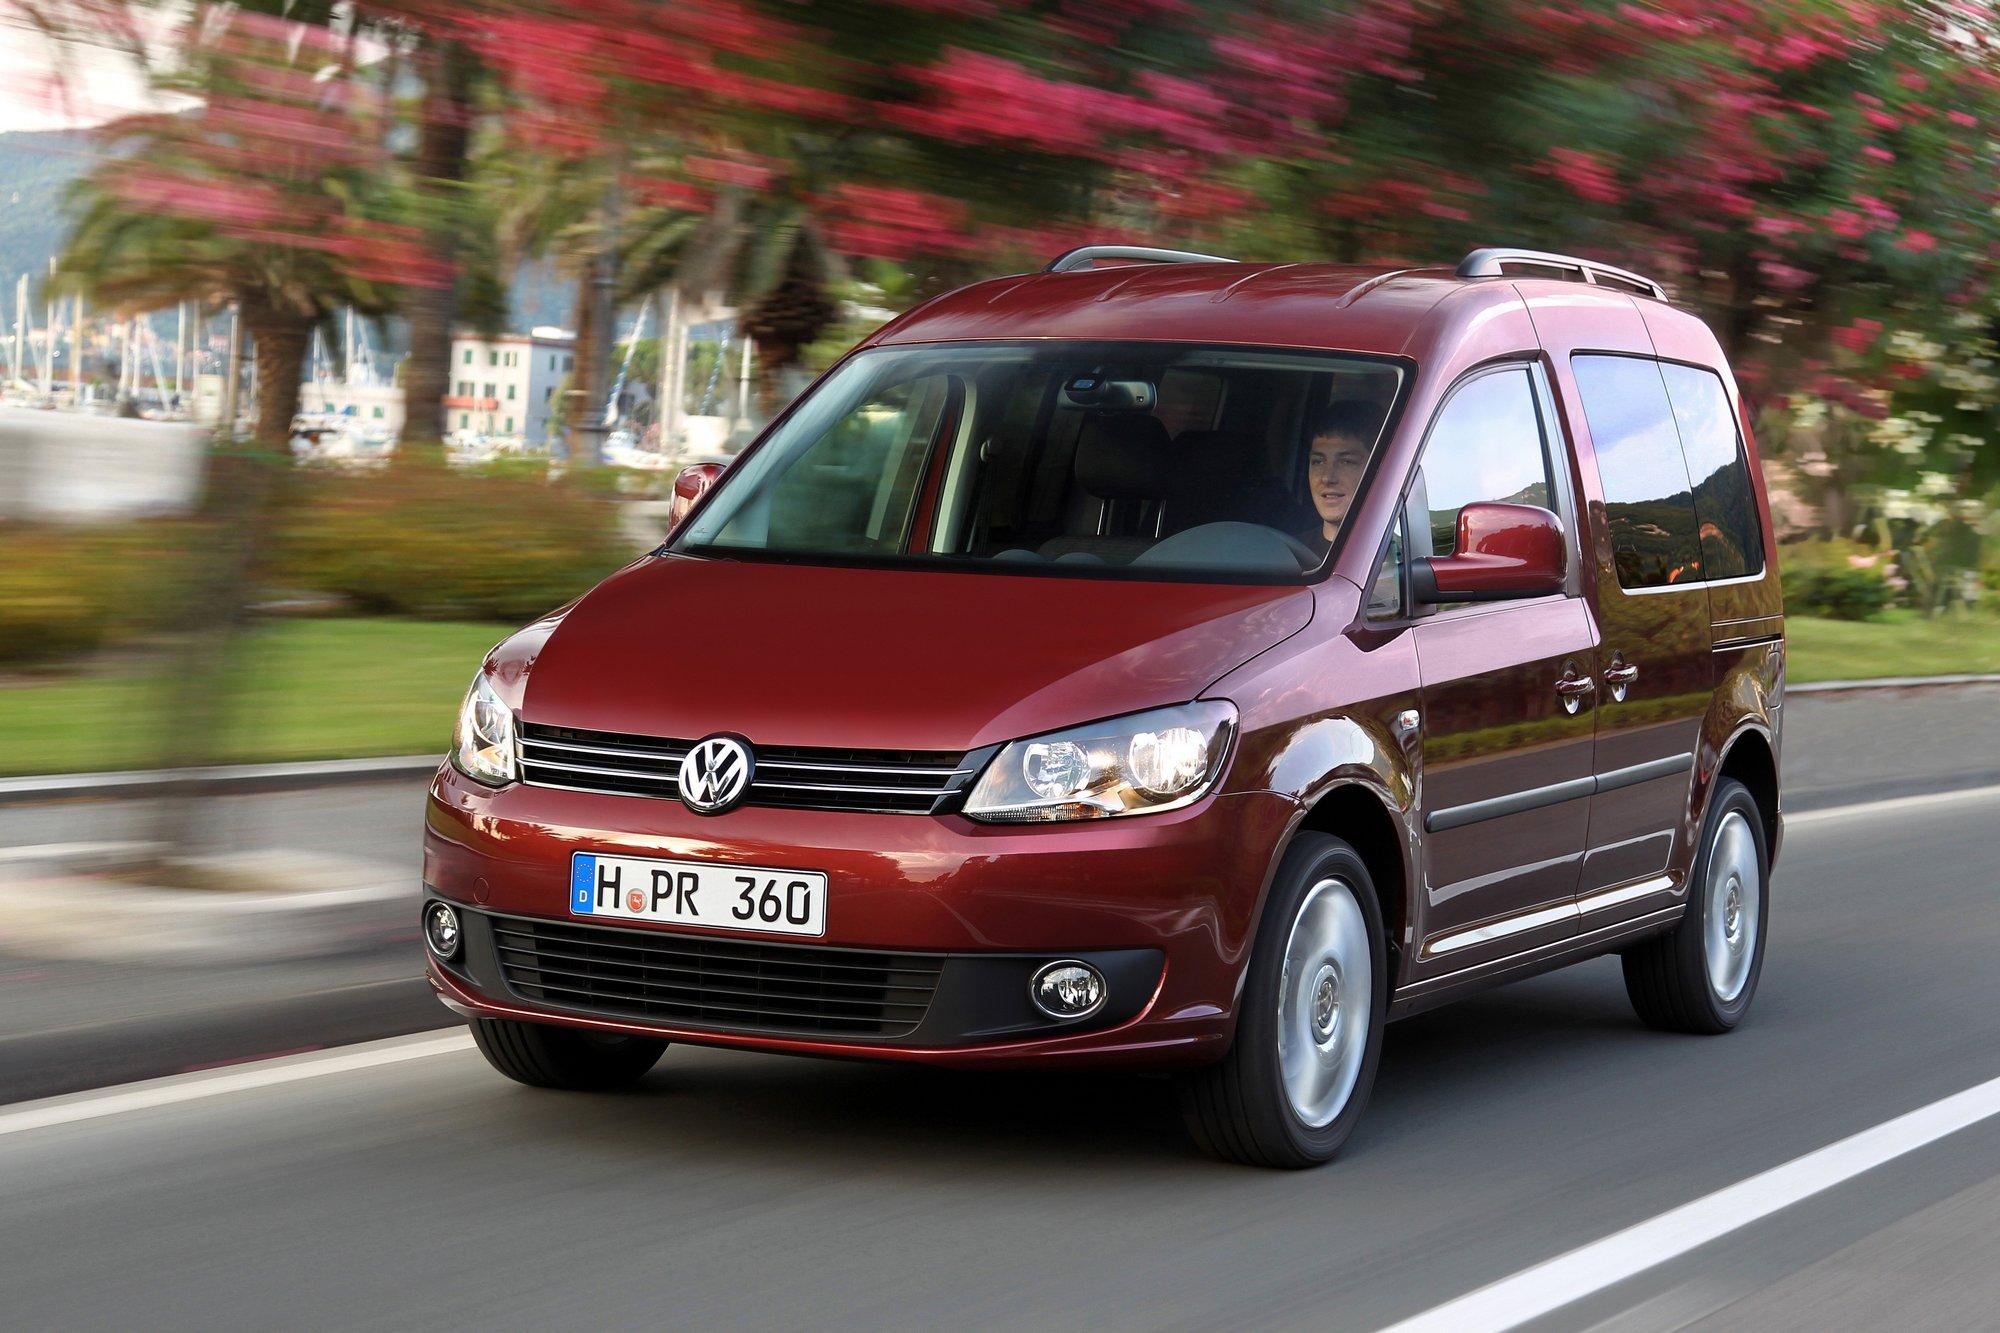 VolkswagenCaddy-001